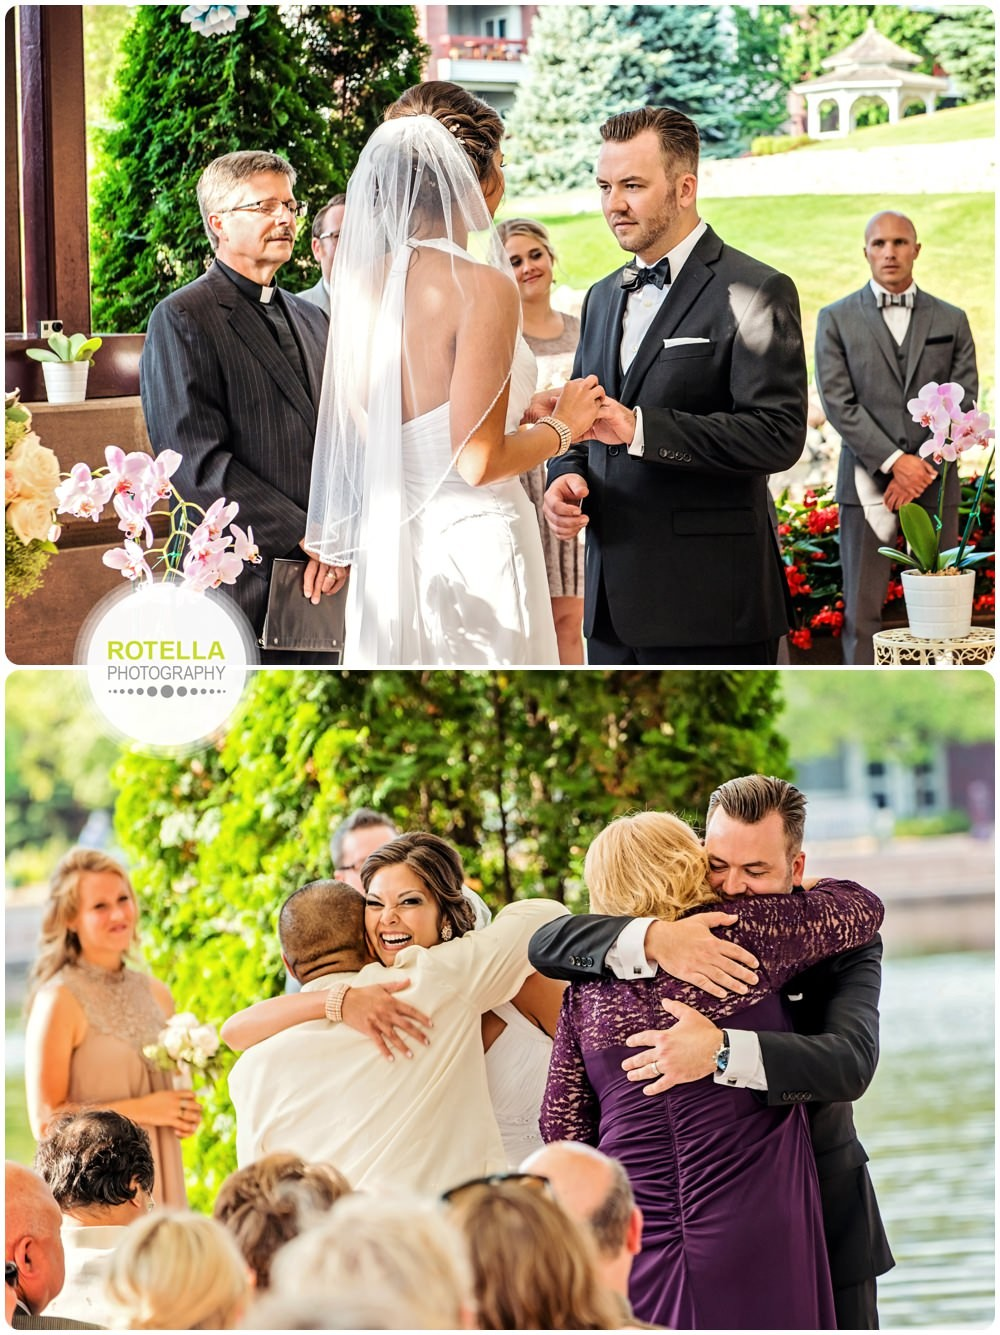 MELANIE-DEREK-MINNESOTA-WEDDING-PHOTOGRAPHY-ROTELLA-PHOTOGRAPHY_2015-12